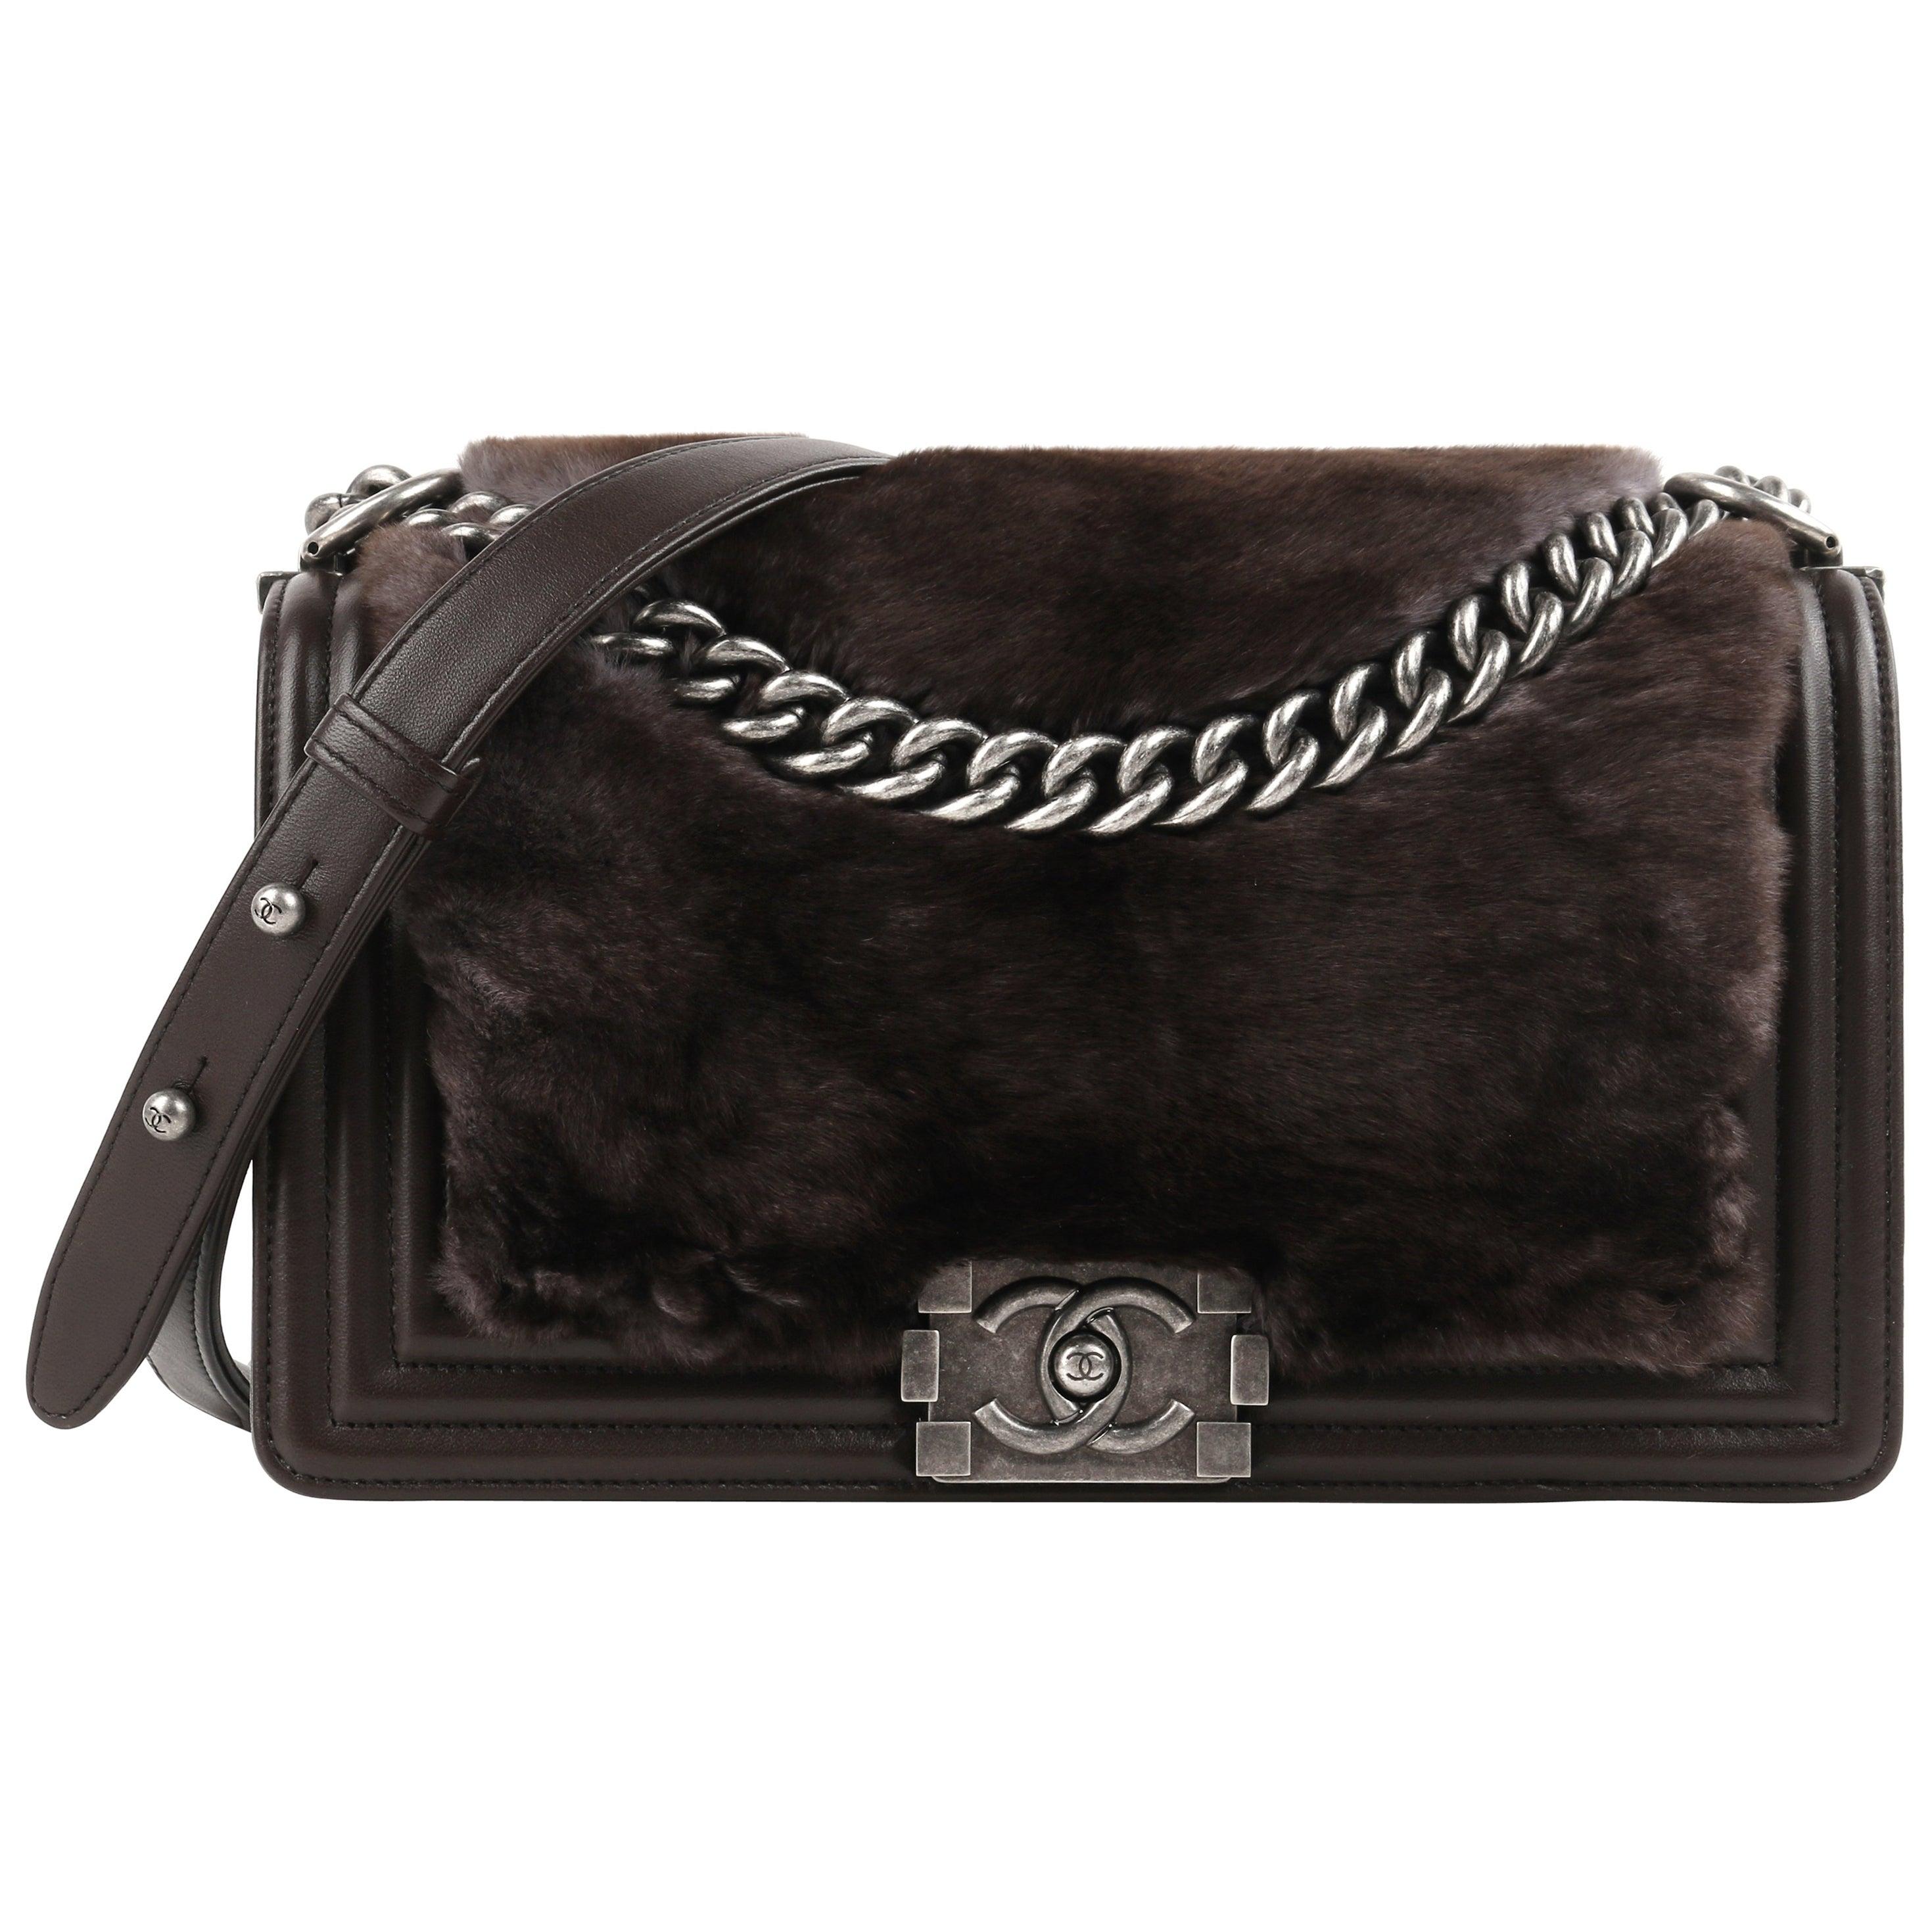 "CHANEL ""Medium Boy"" Brown Leather Sheared Rabbit Fur Flap Bag Cross Body Handbag"